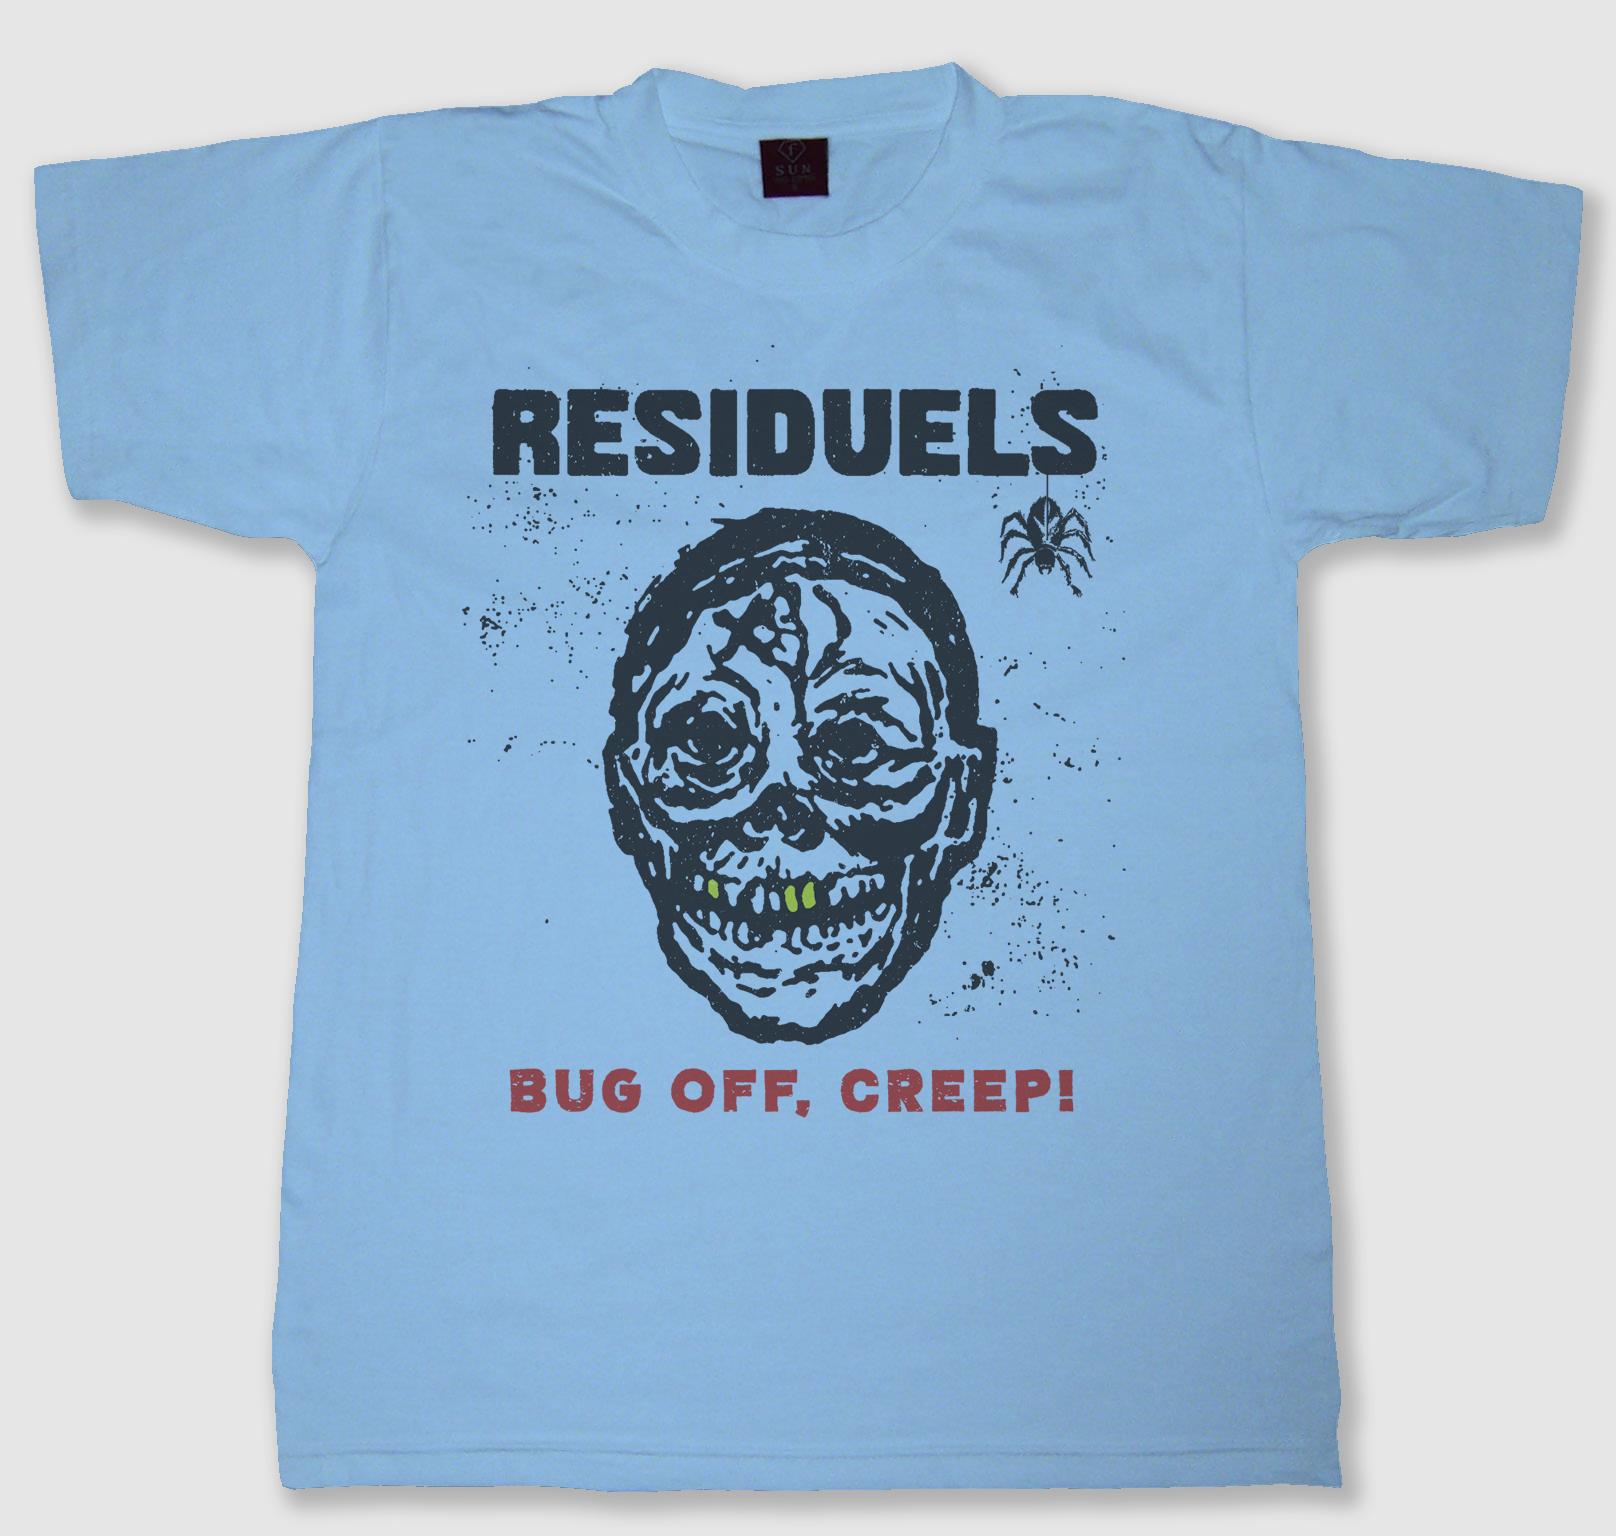 RESIDUELS T SHIRT1.jpg